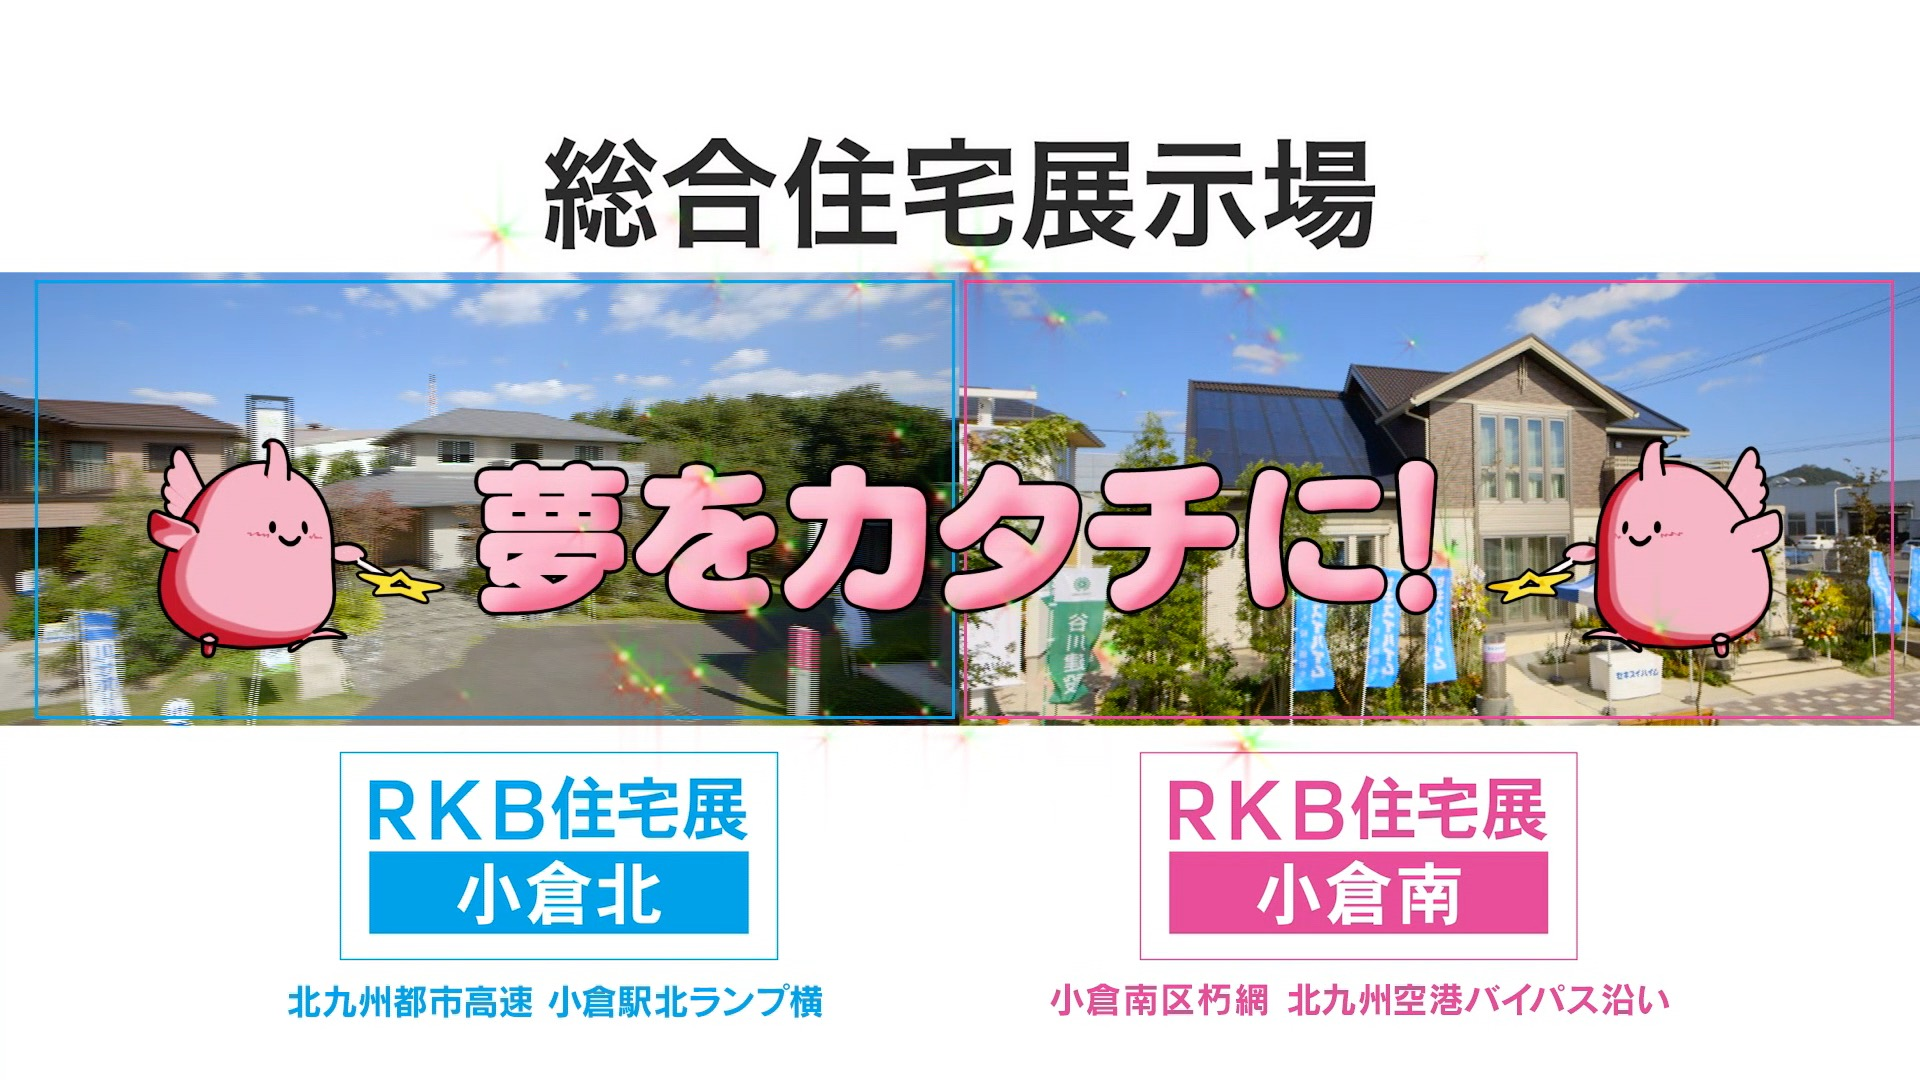 RKB住宅展 小倉北 小倉南 TVCM